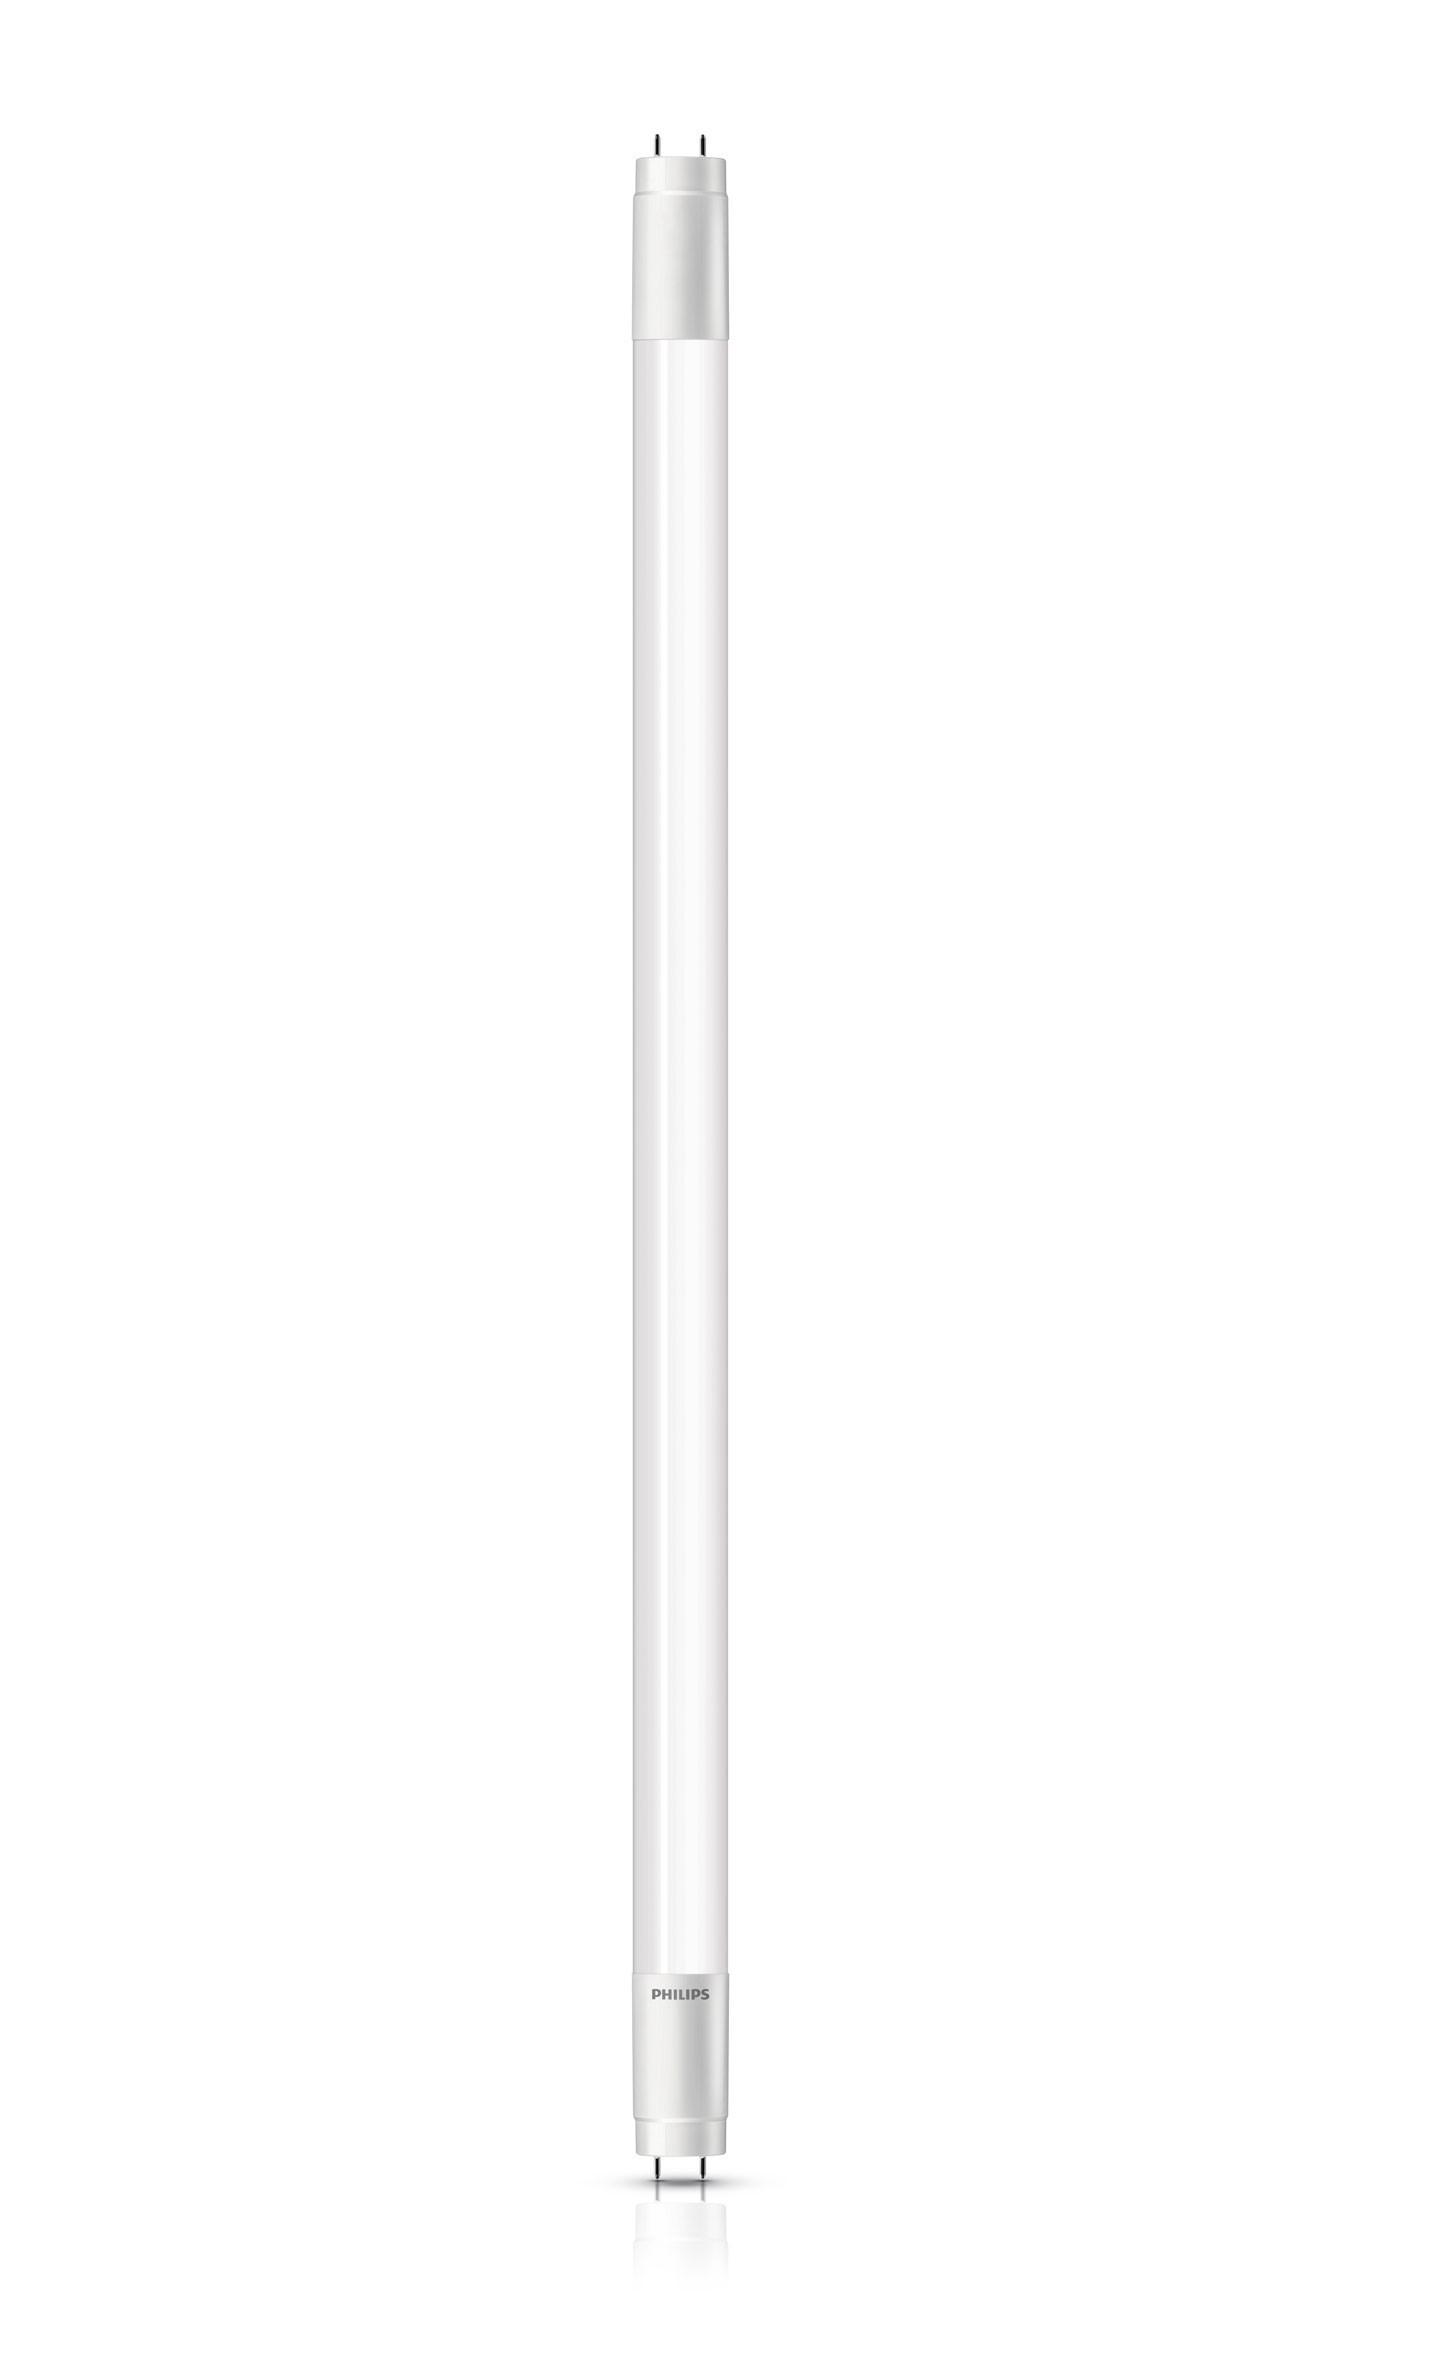 Philips LED Leuchtstofflampe T8 G13 20 Watt L 1200mm Bild 1